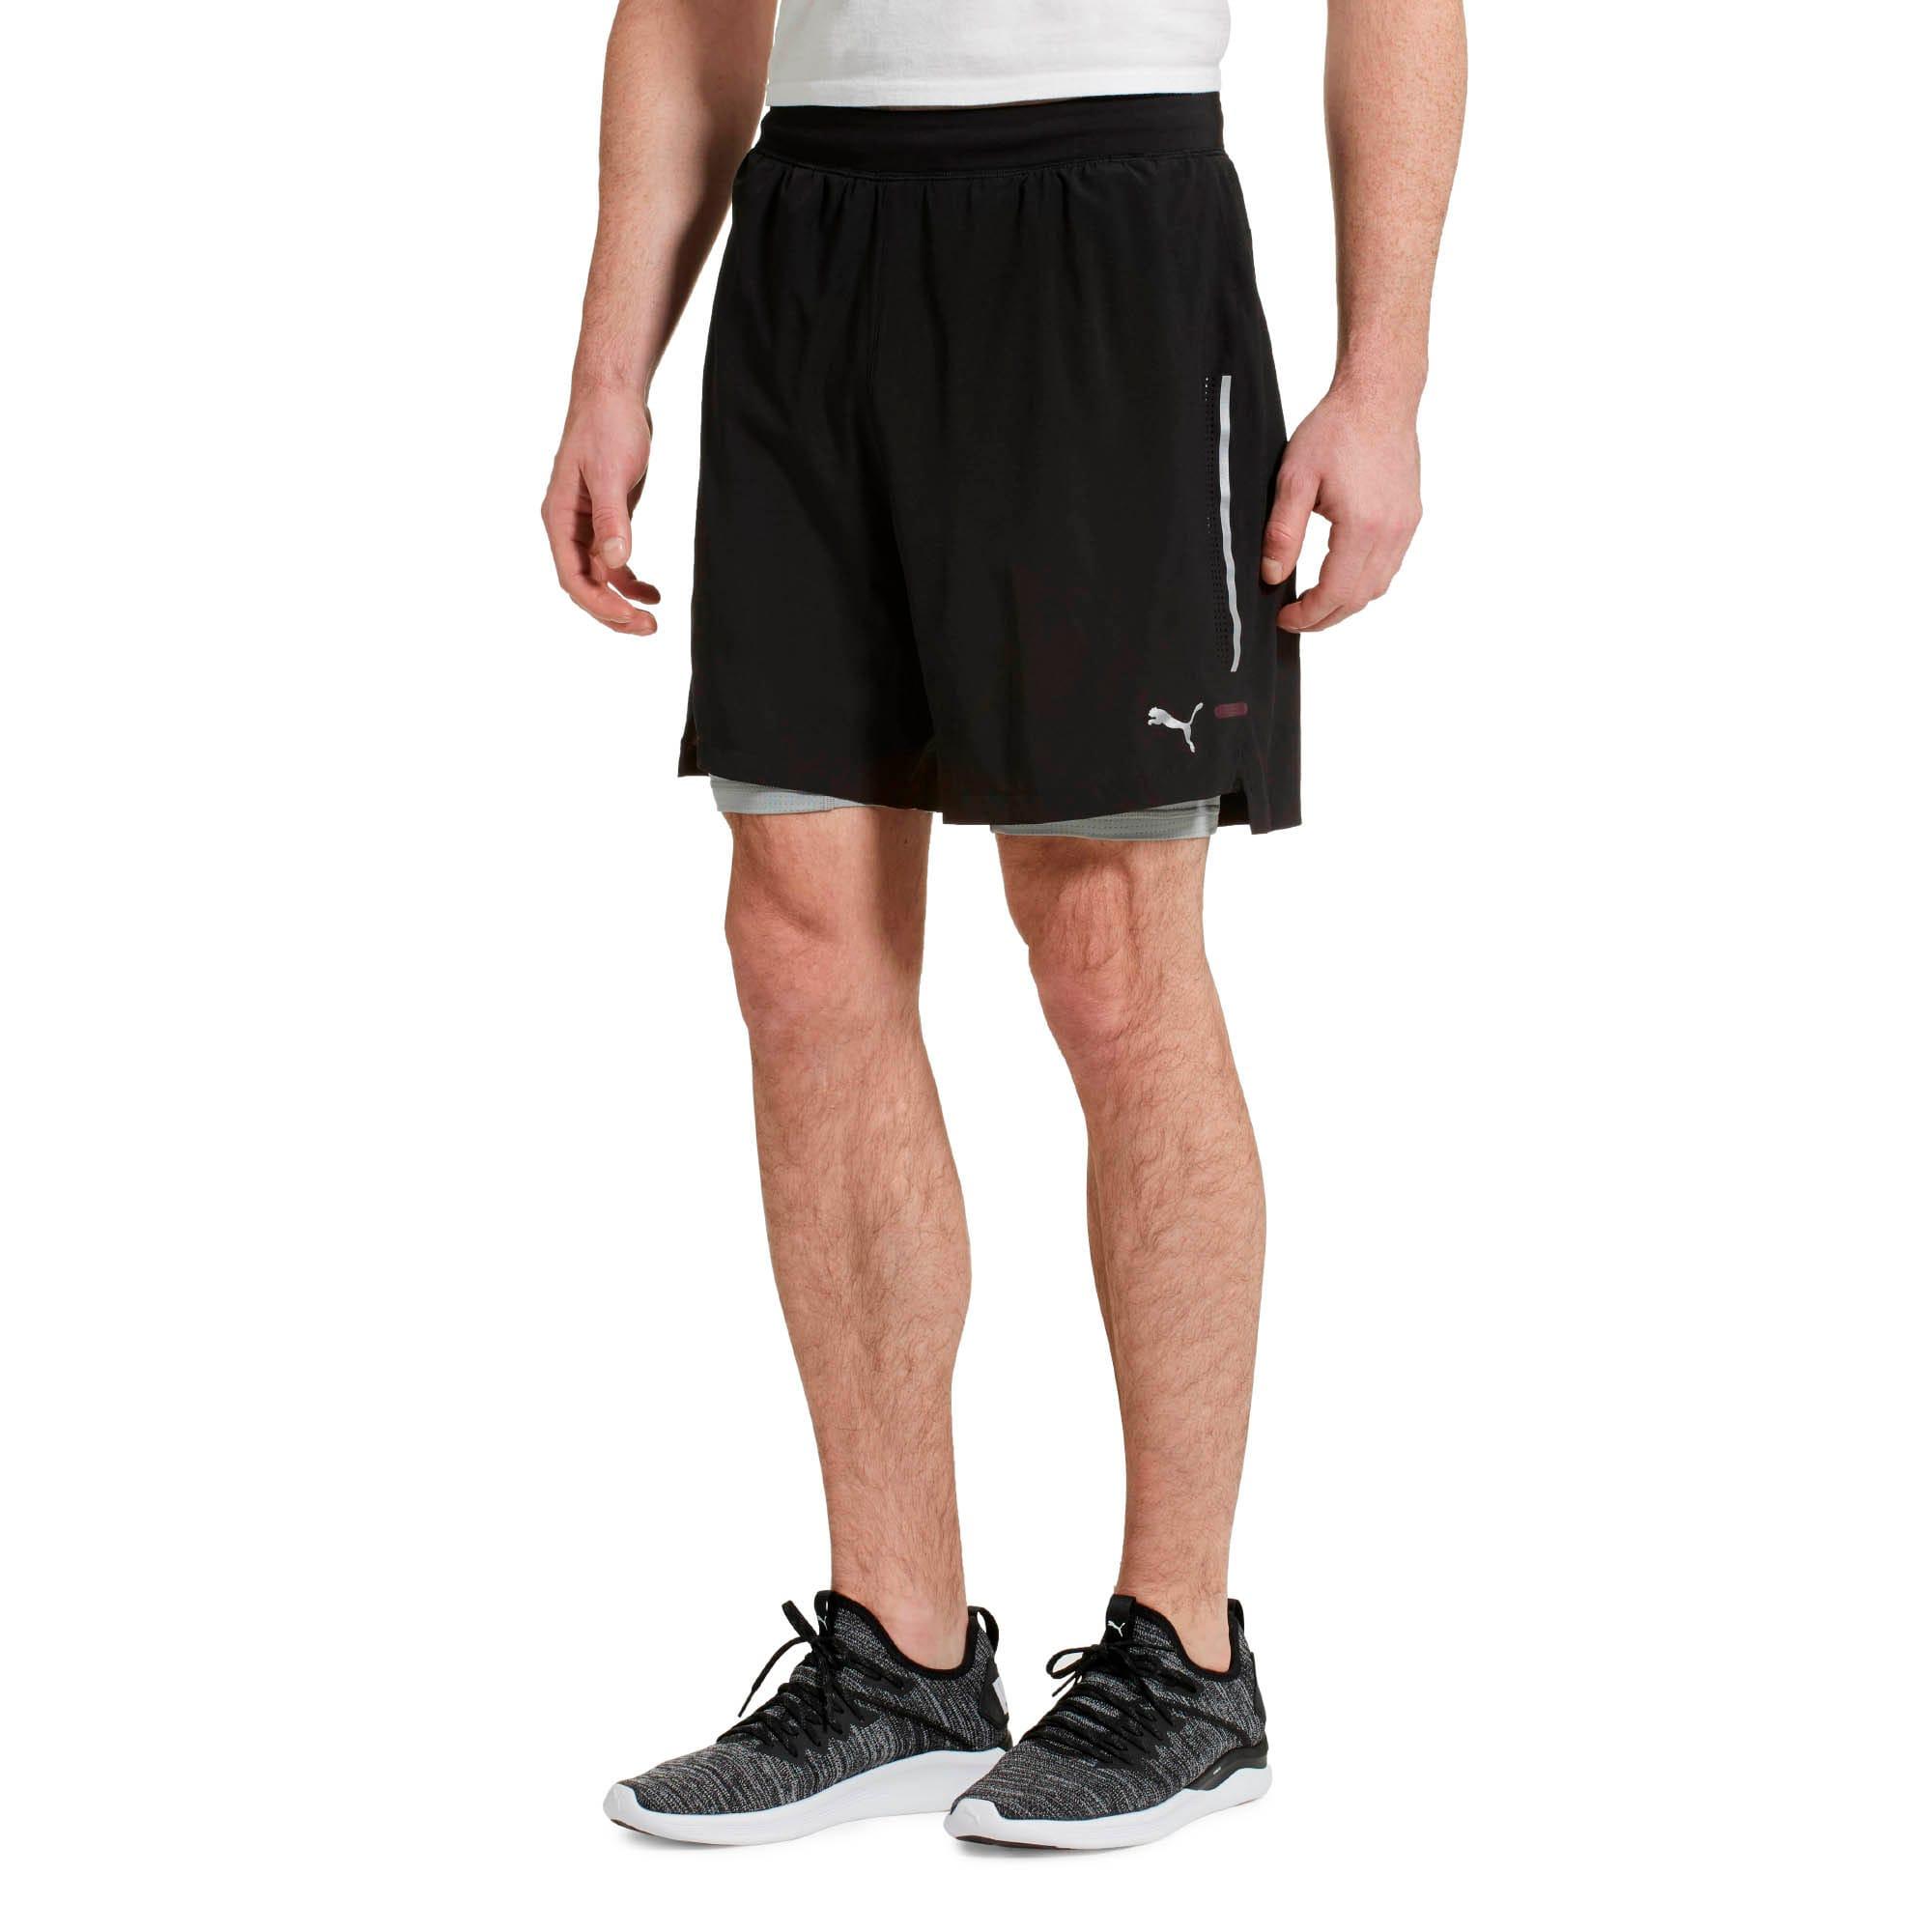 PWRRUN 2-in-1 7'' Men's Running Shorts